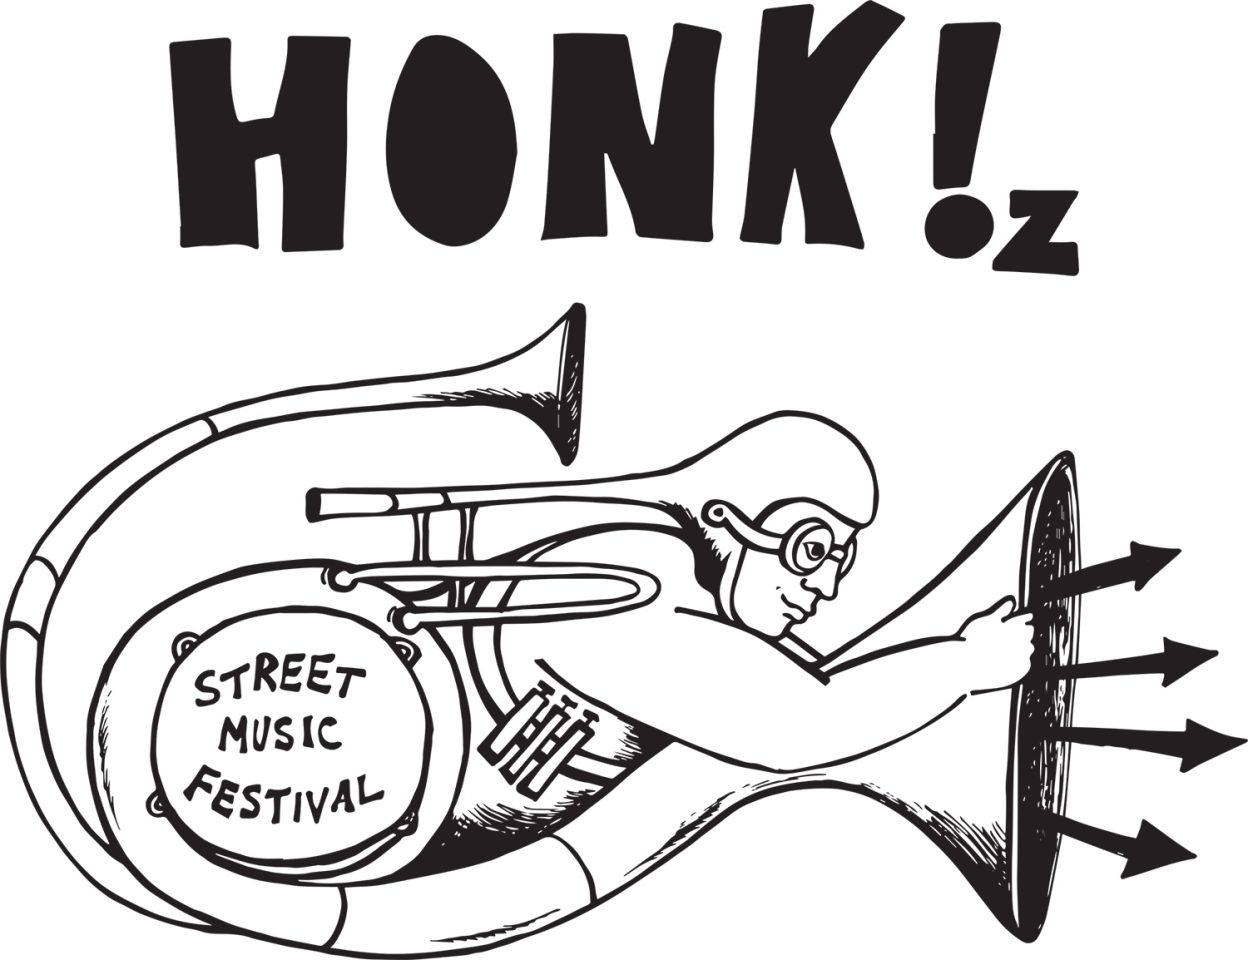 HONK! Oz